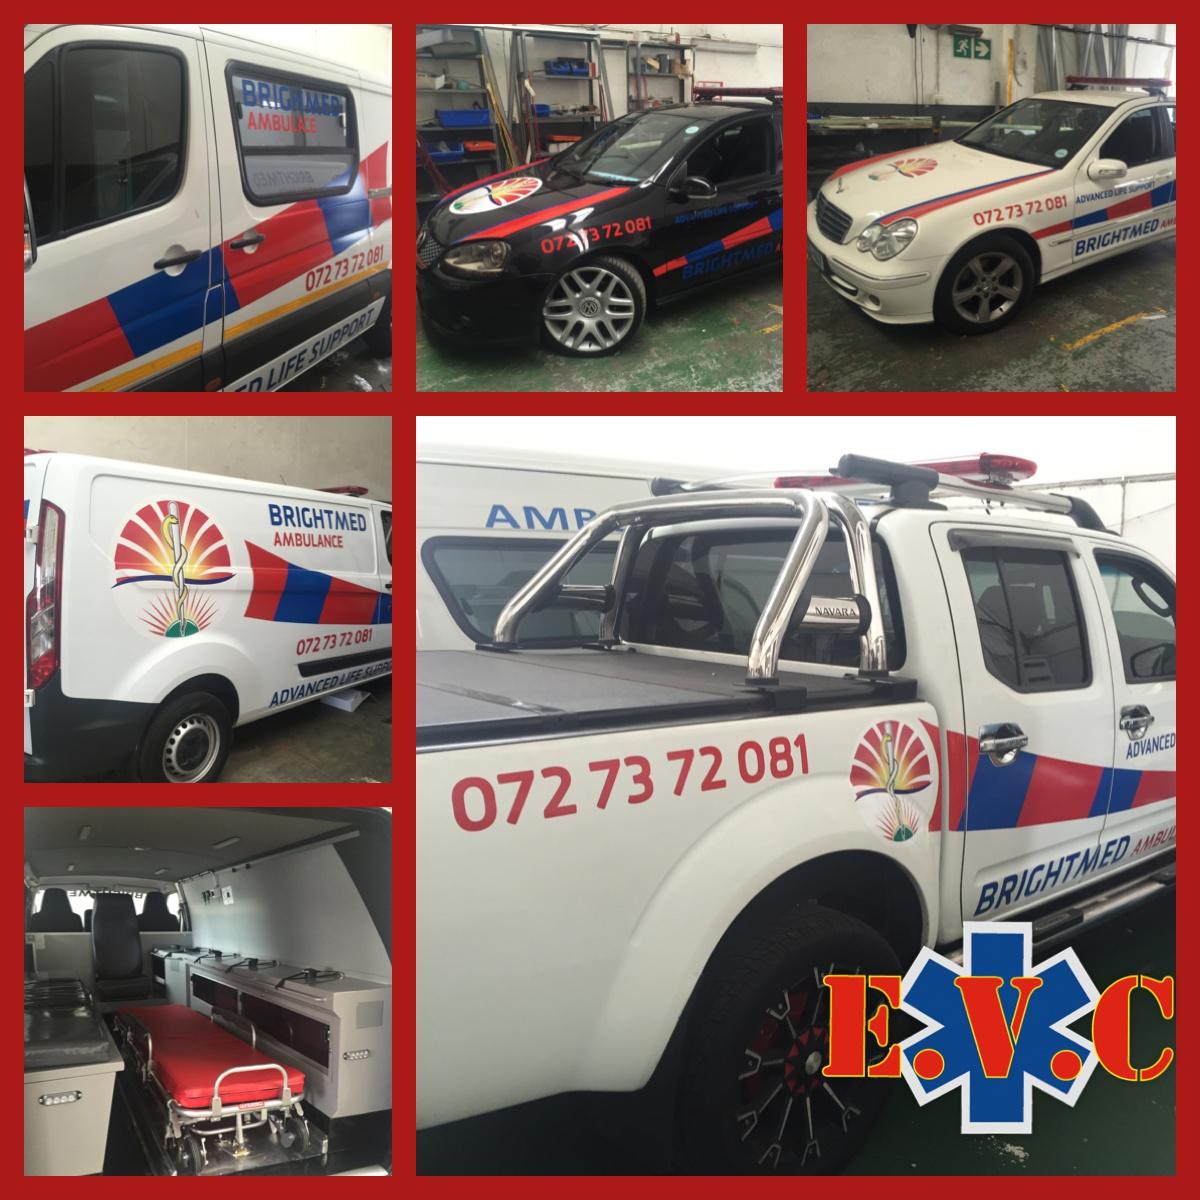 New Ambulances and Response Cars for Brightmed Ambulance